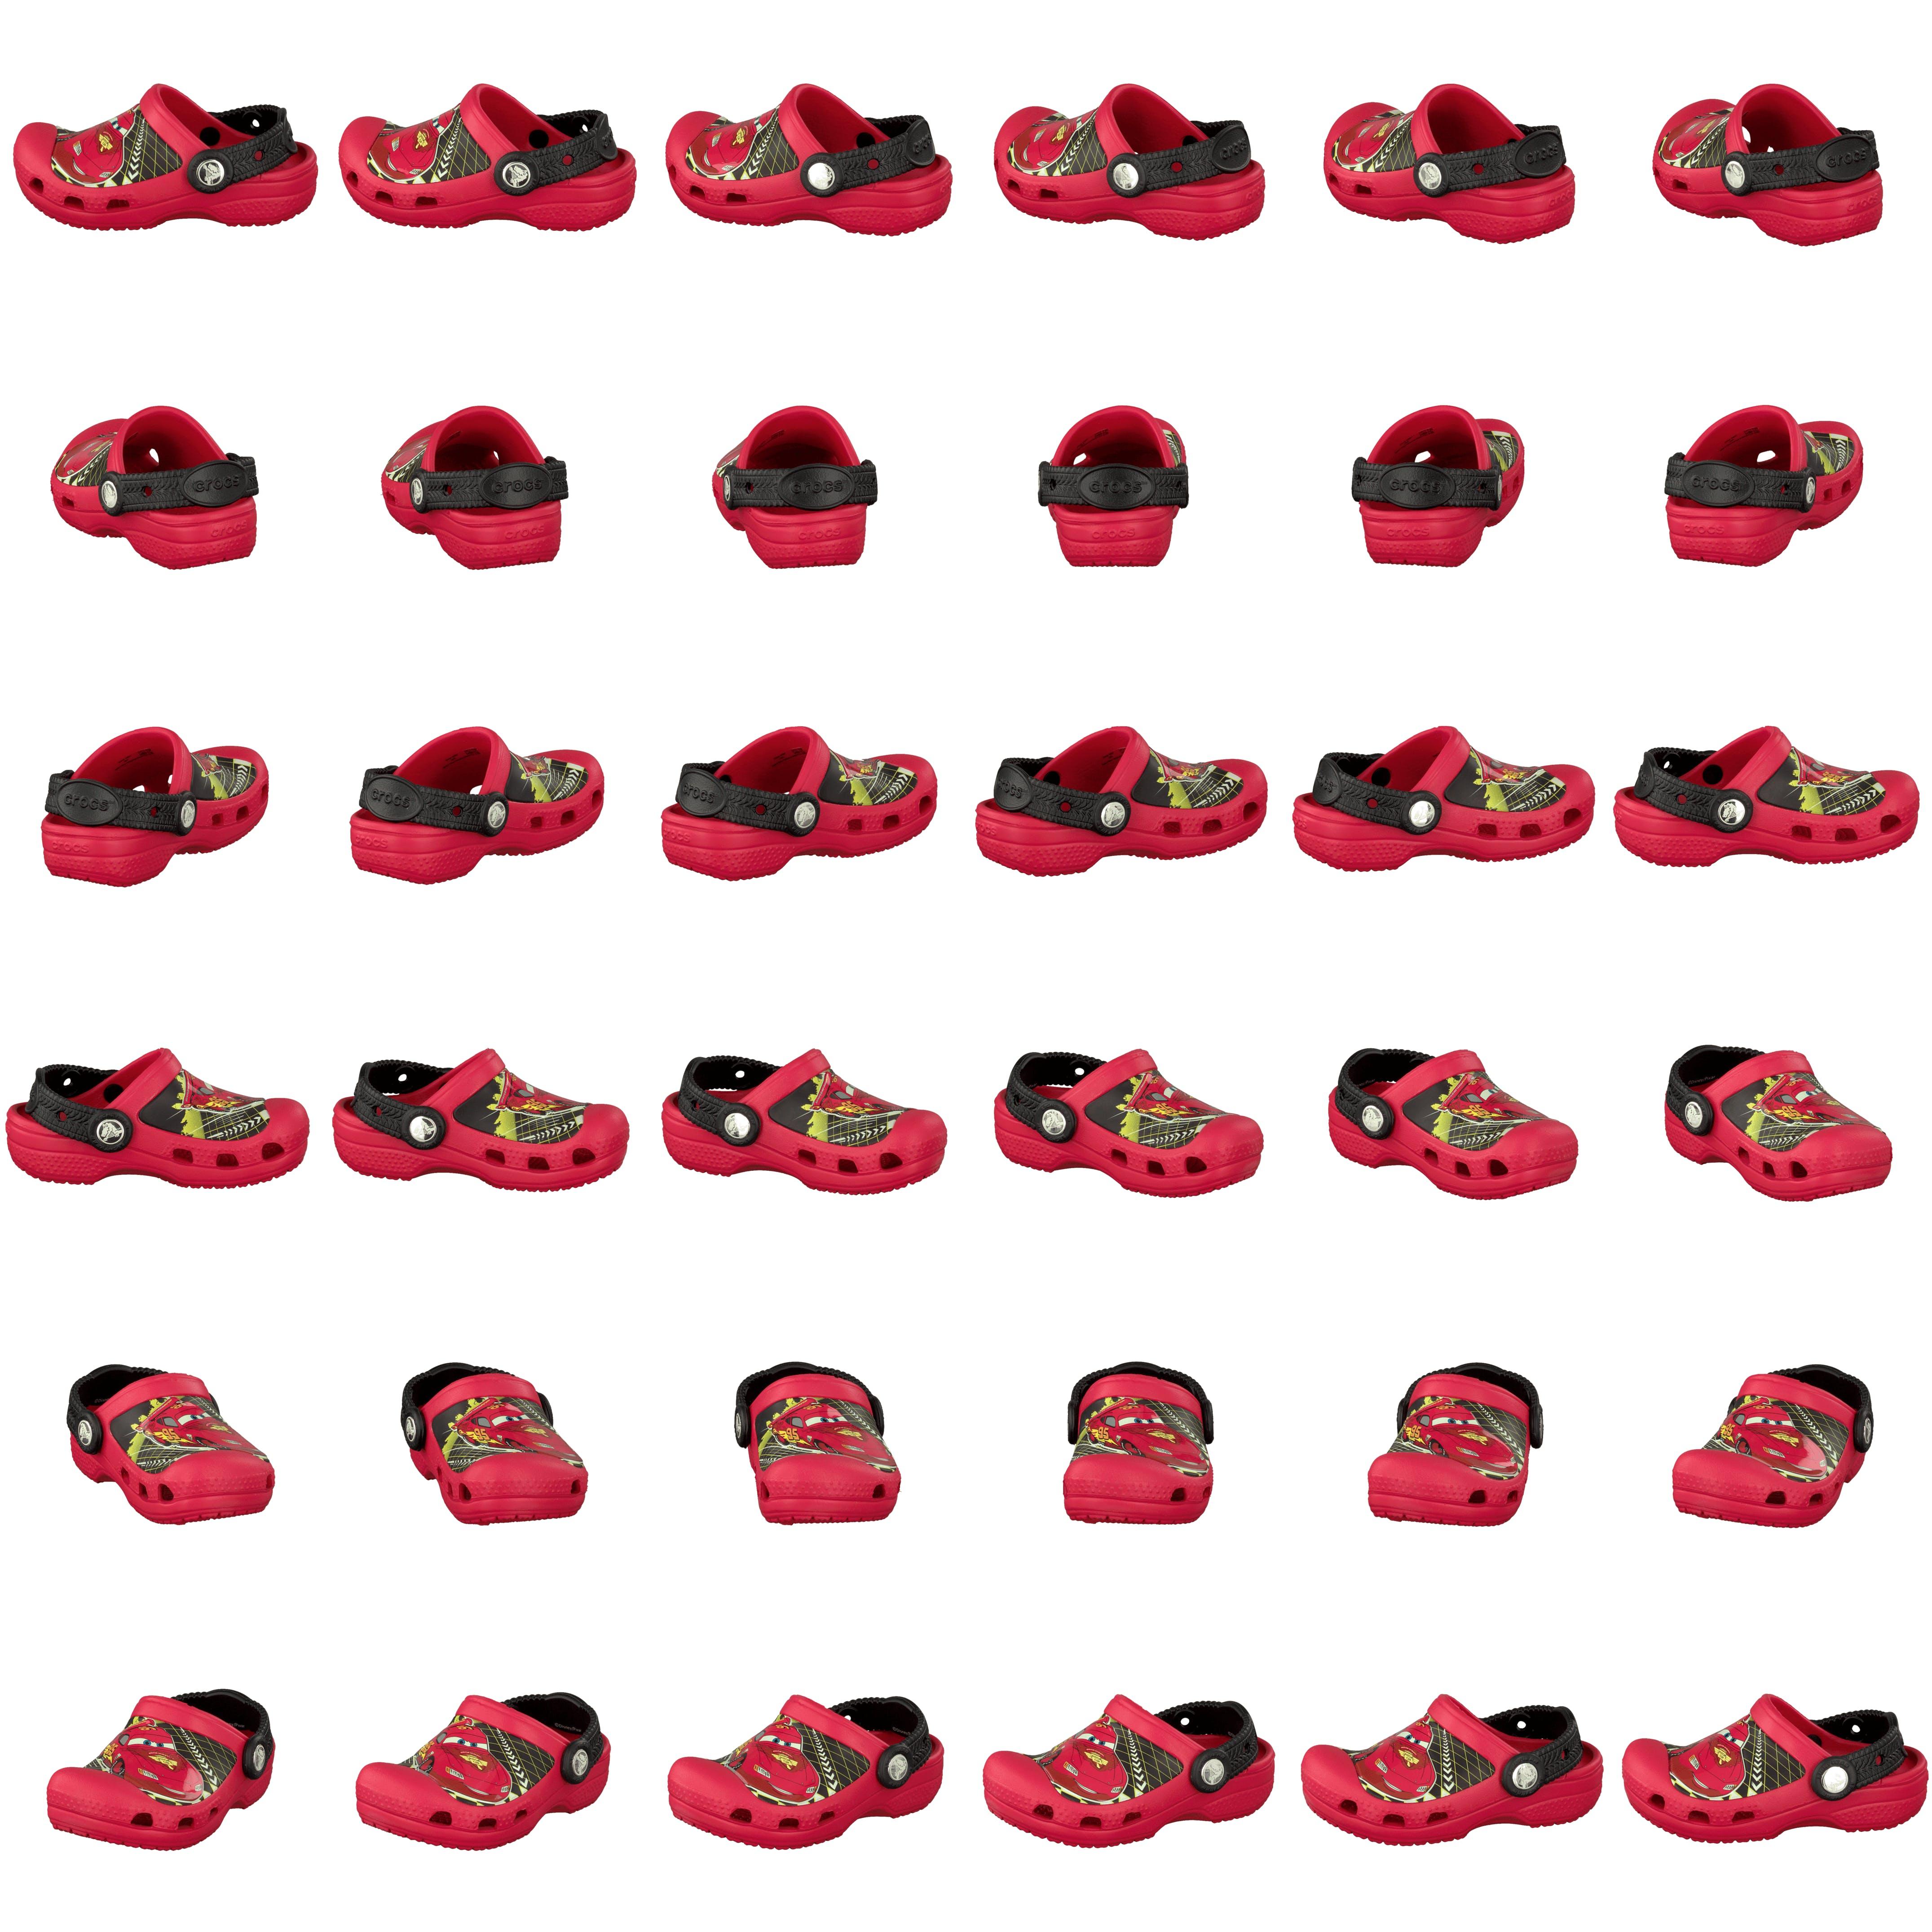 Köp Crocs CC Lightning McQueen Clog Red Skor Online | FOOTWAY.se